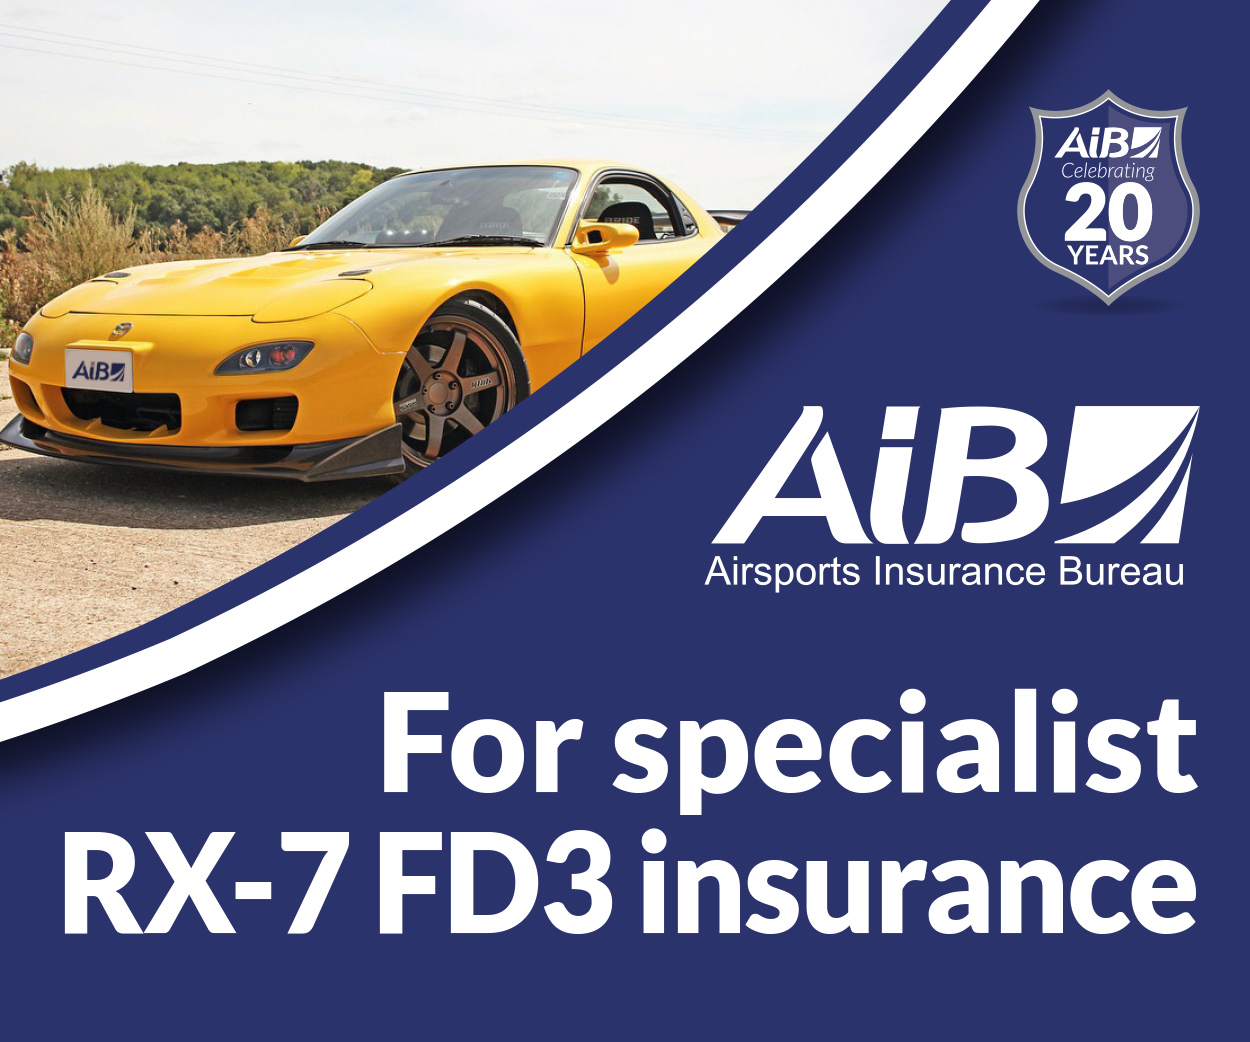 AIB Insurance partner image